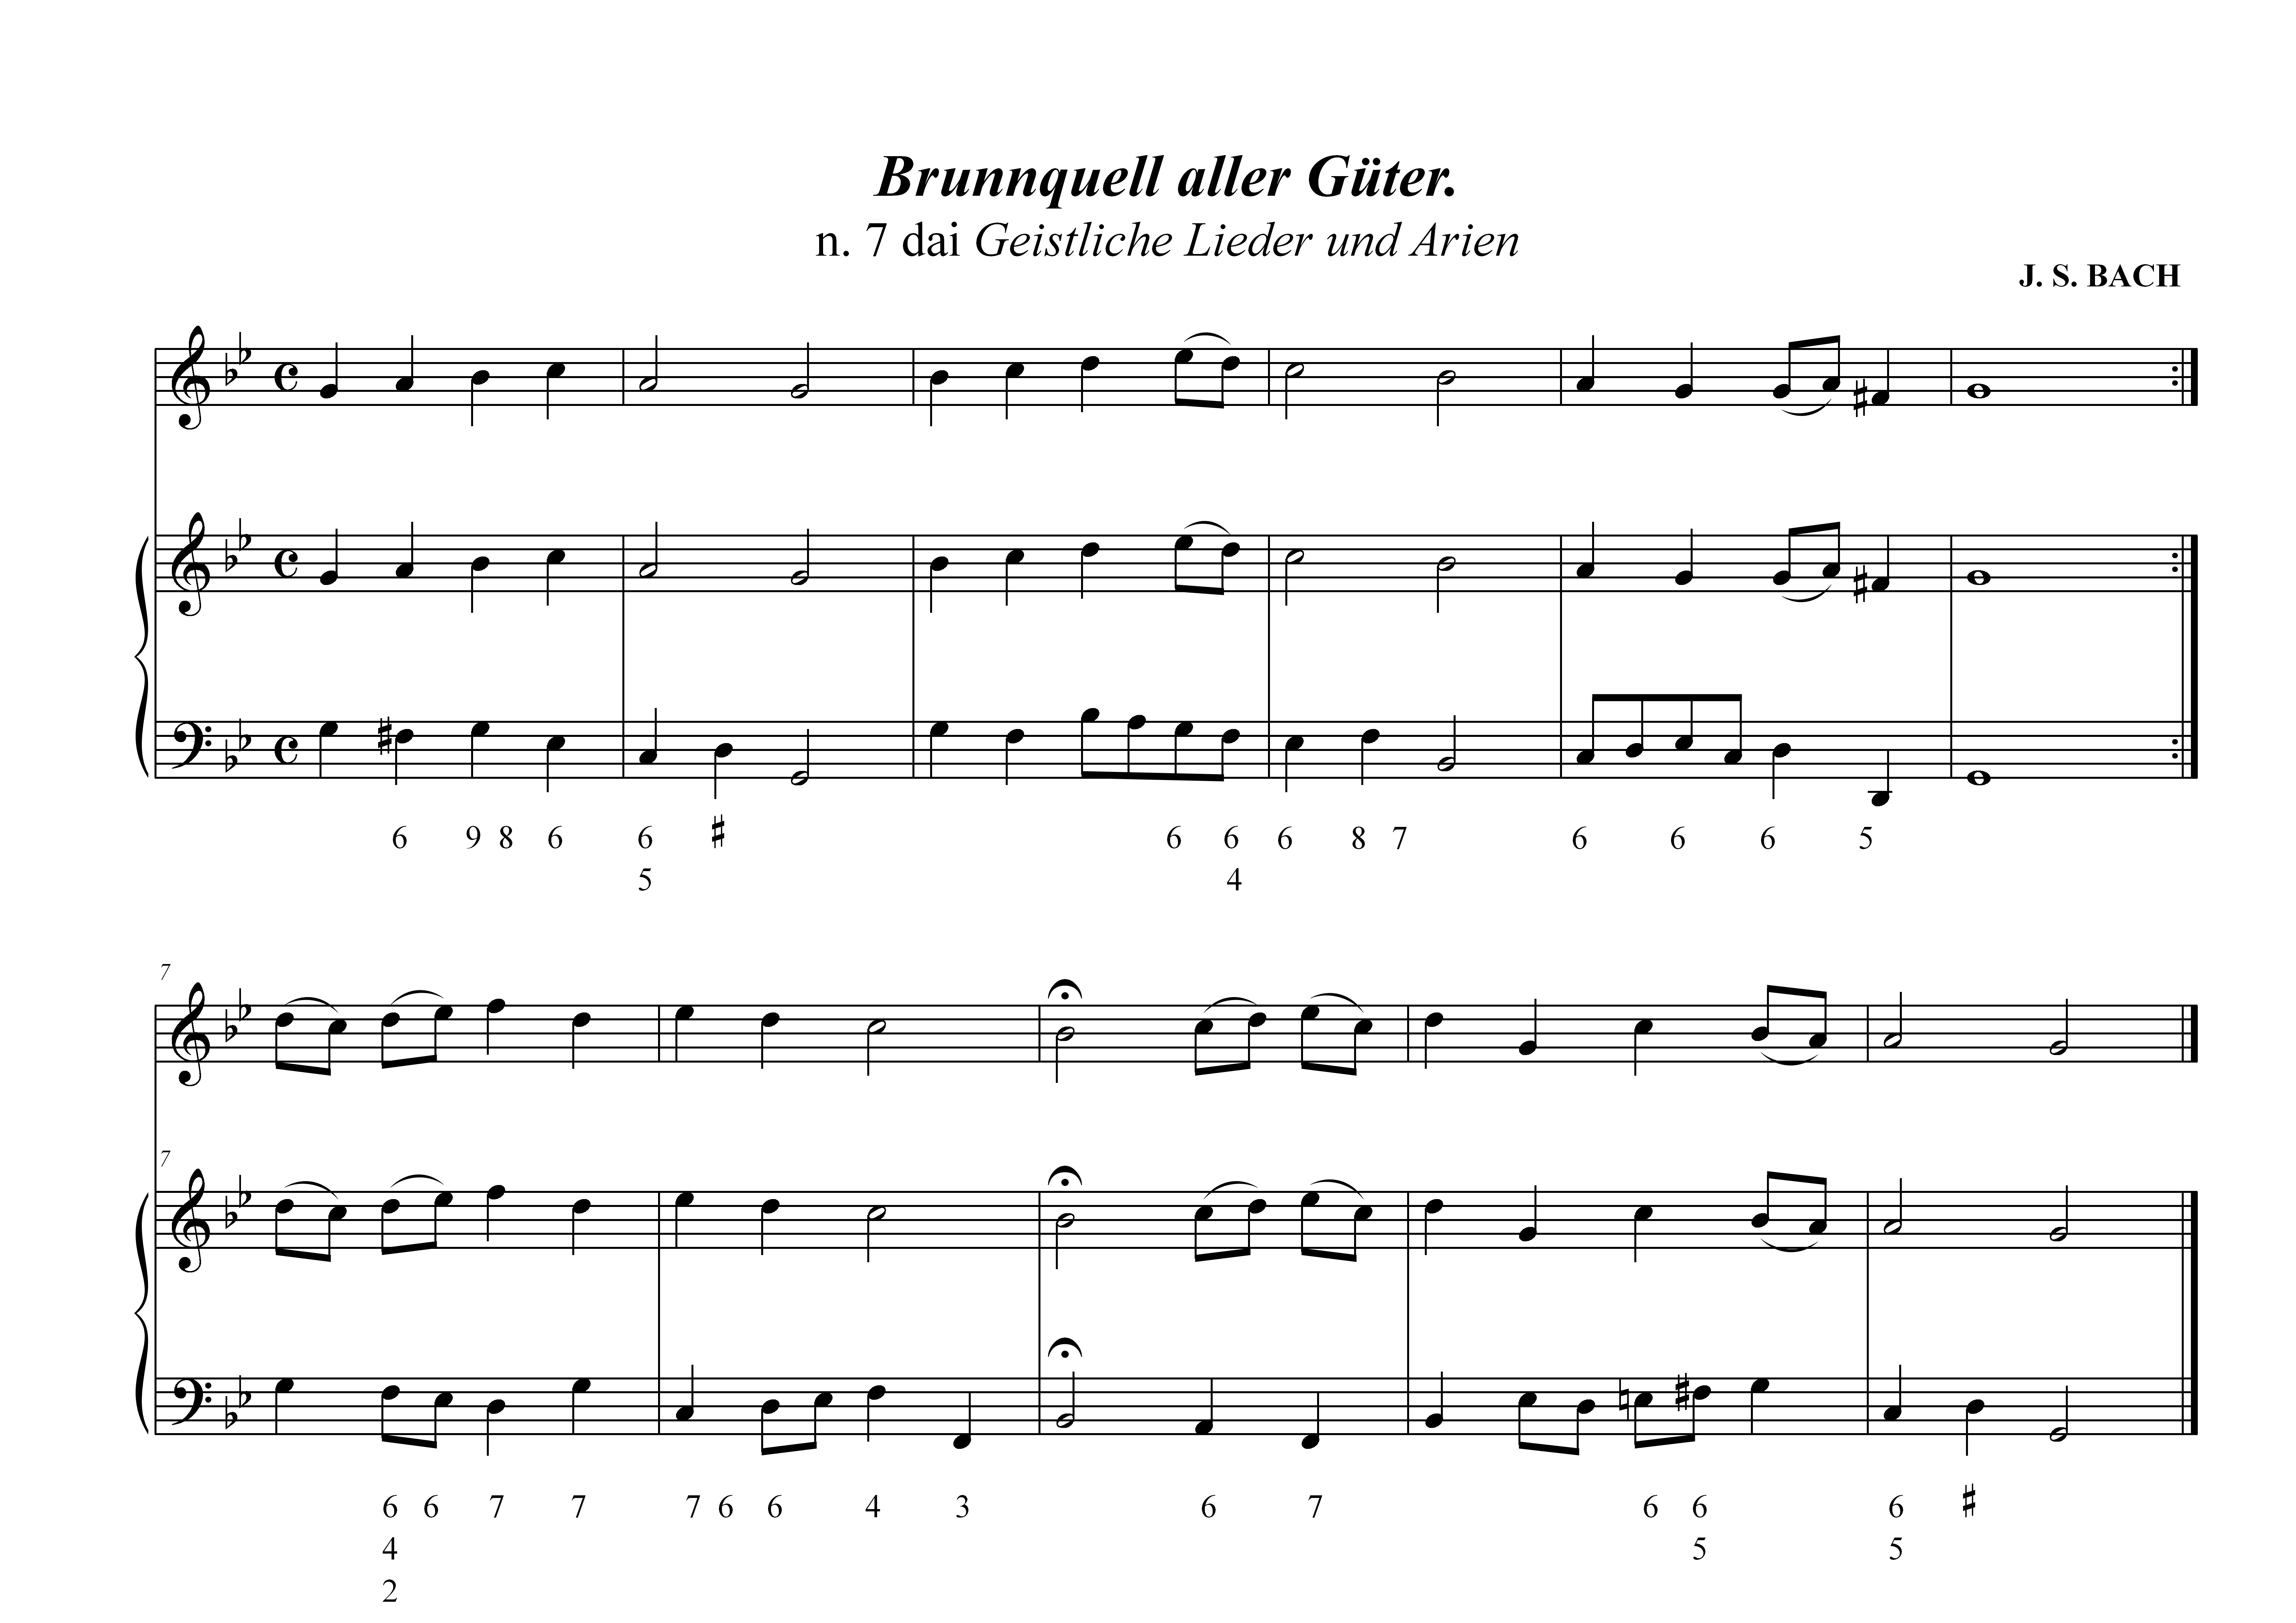 bc - Bach n. 7 Canti sacri - II fase (raddoppio canto)